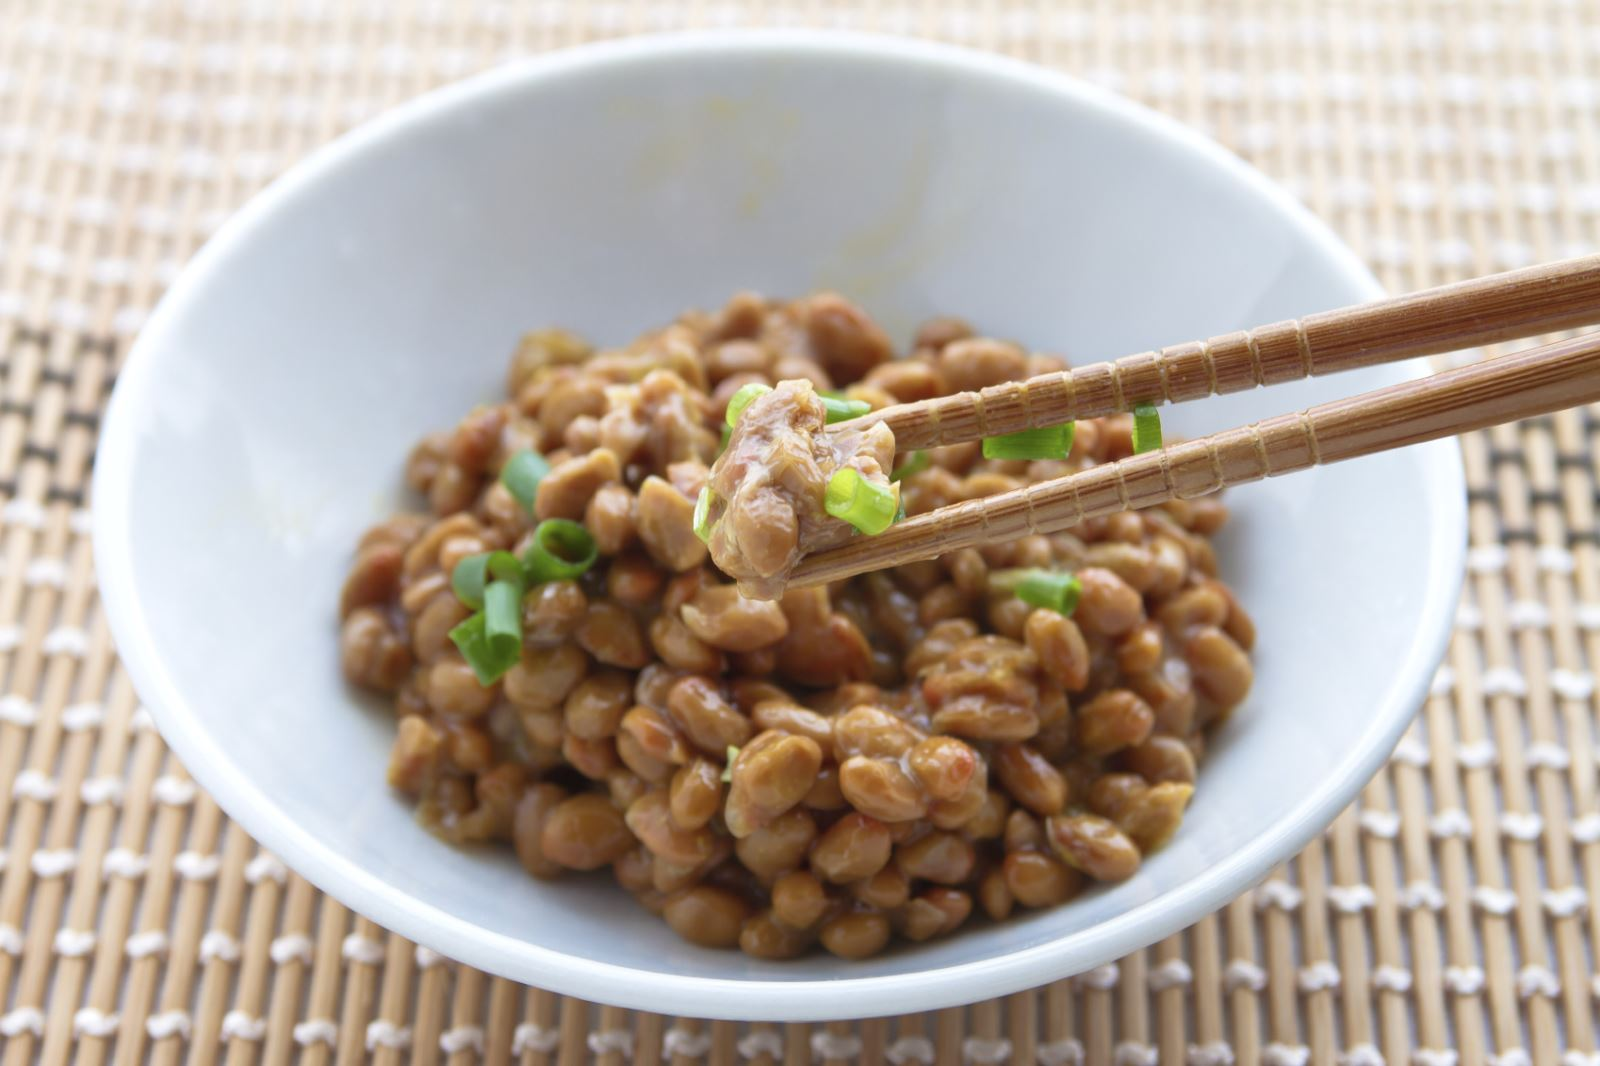 vien-uong-chong-tai-bien-dot-quy-nattokinase-nhat-ban